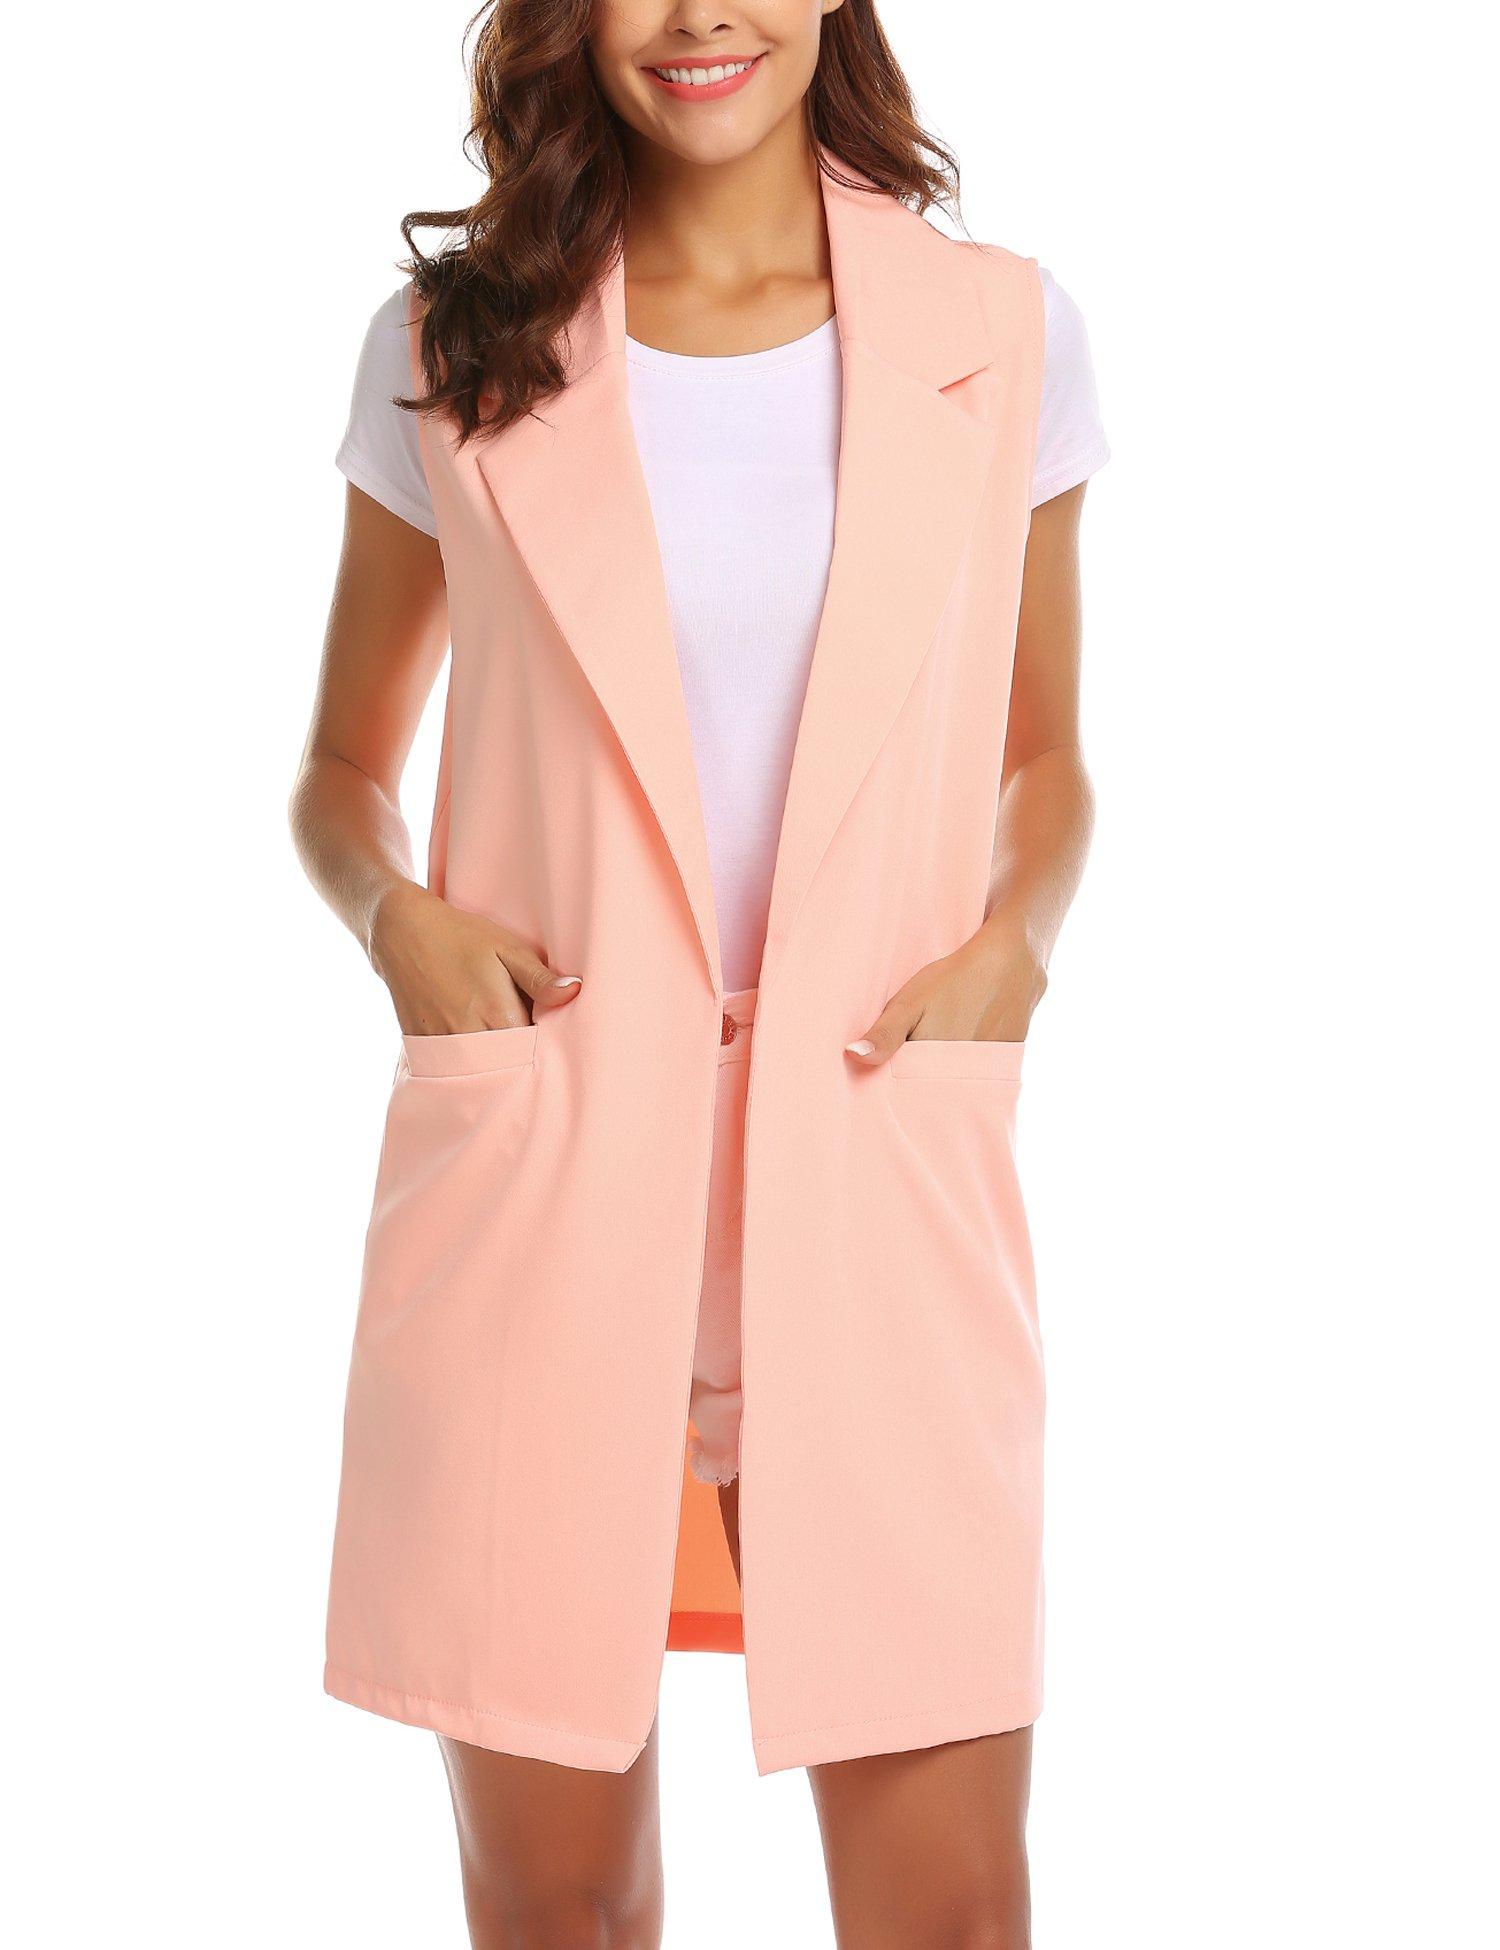 Showyoo Women's Long Sleeveless Duster Trench Vest Casual Lapel Blazer Jacket Pink XXL